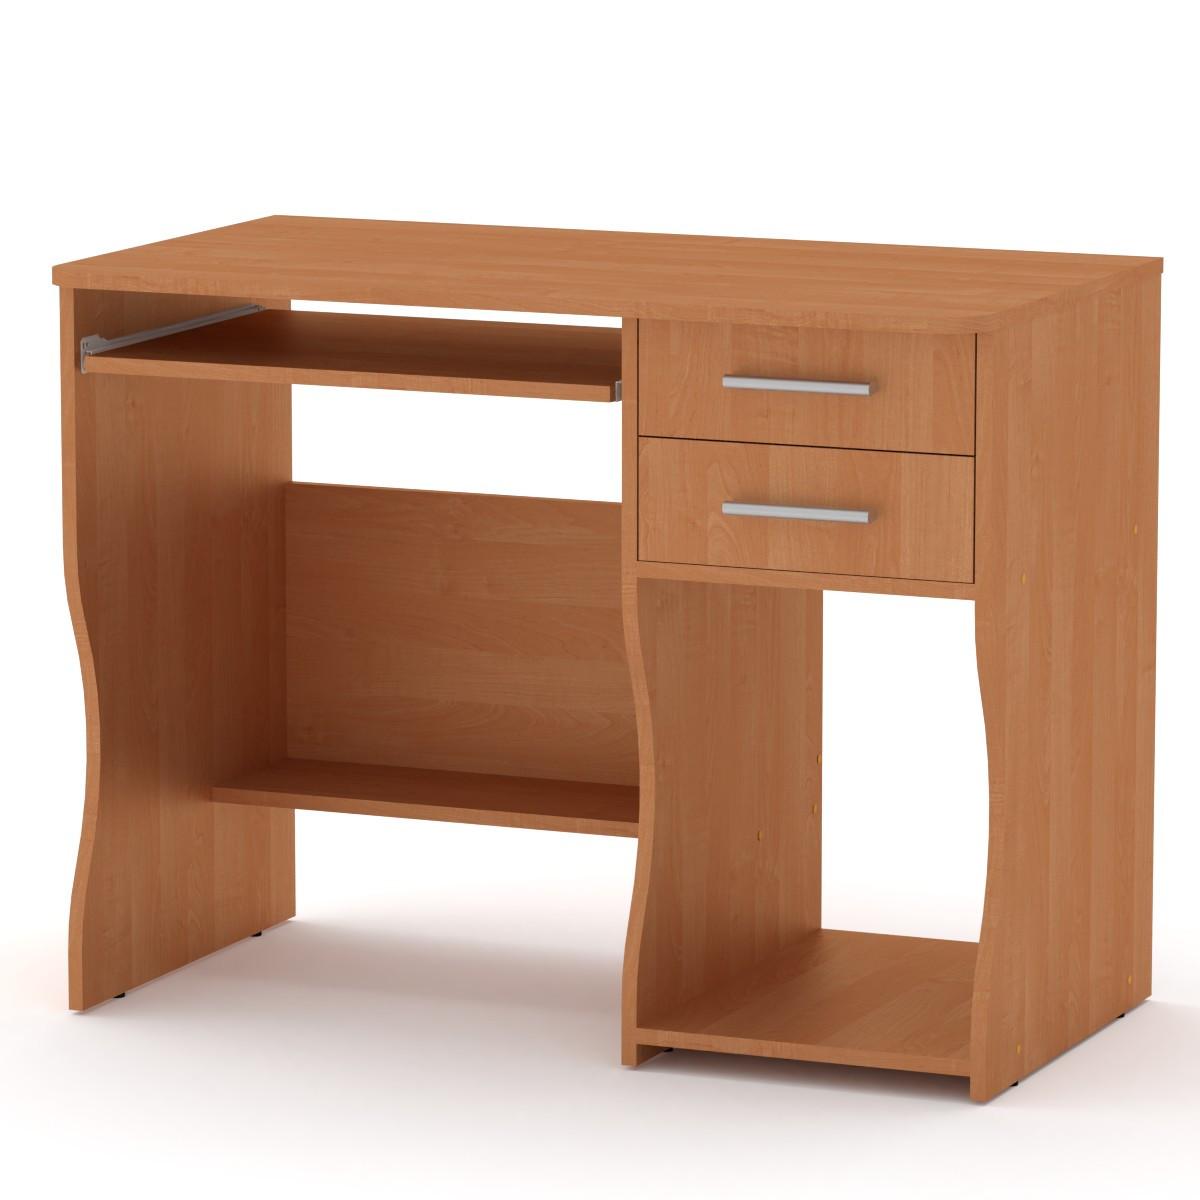 Стол компьютерный СКМ 7 Компанит 100х55х77 см Ольха